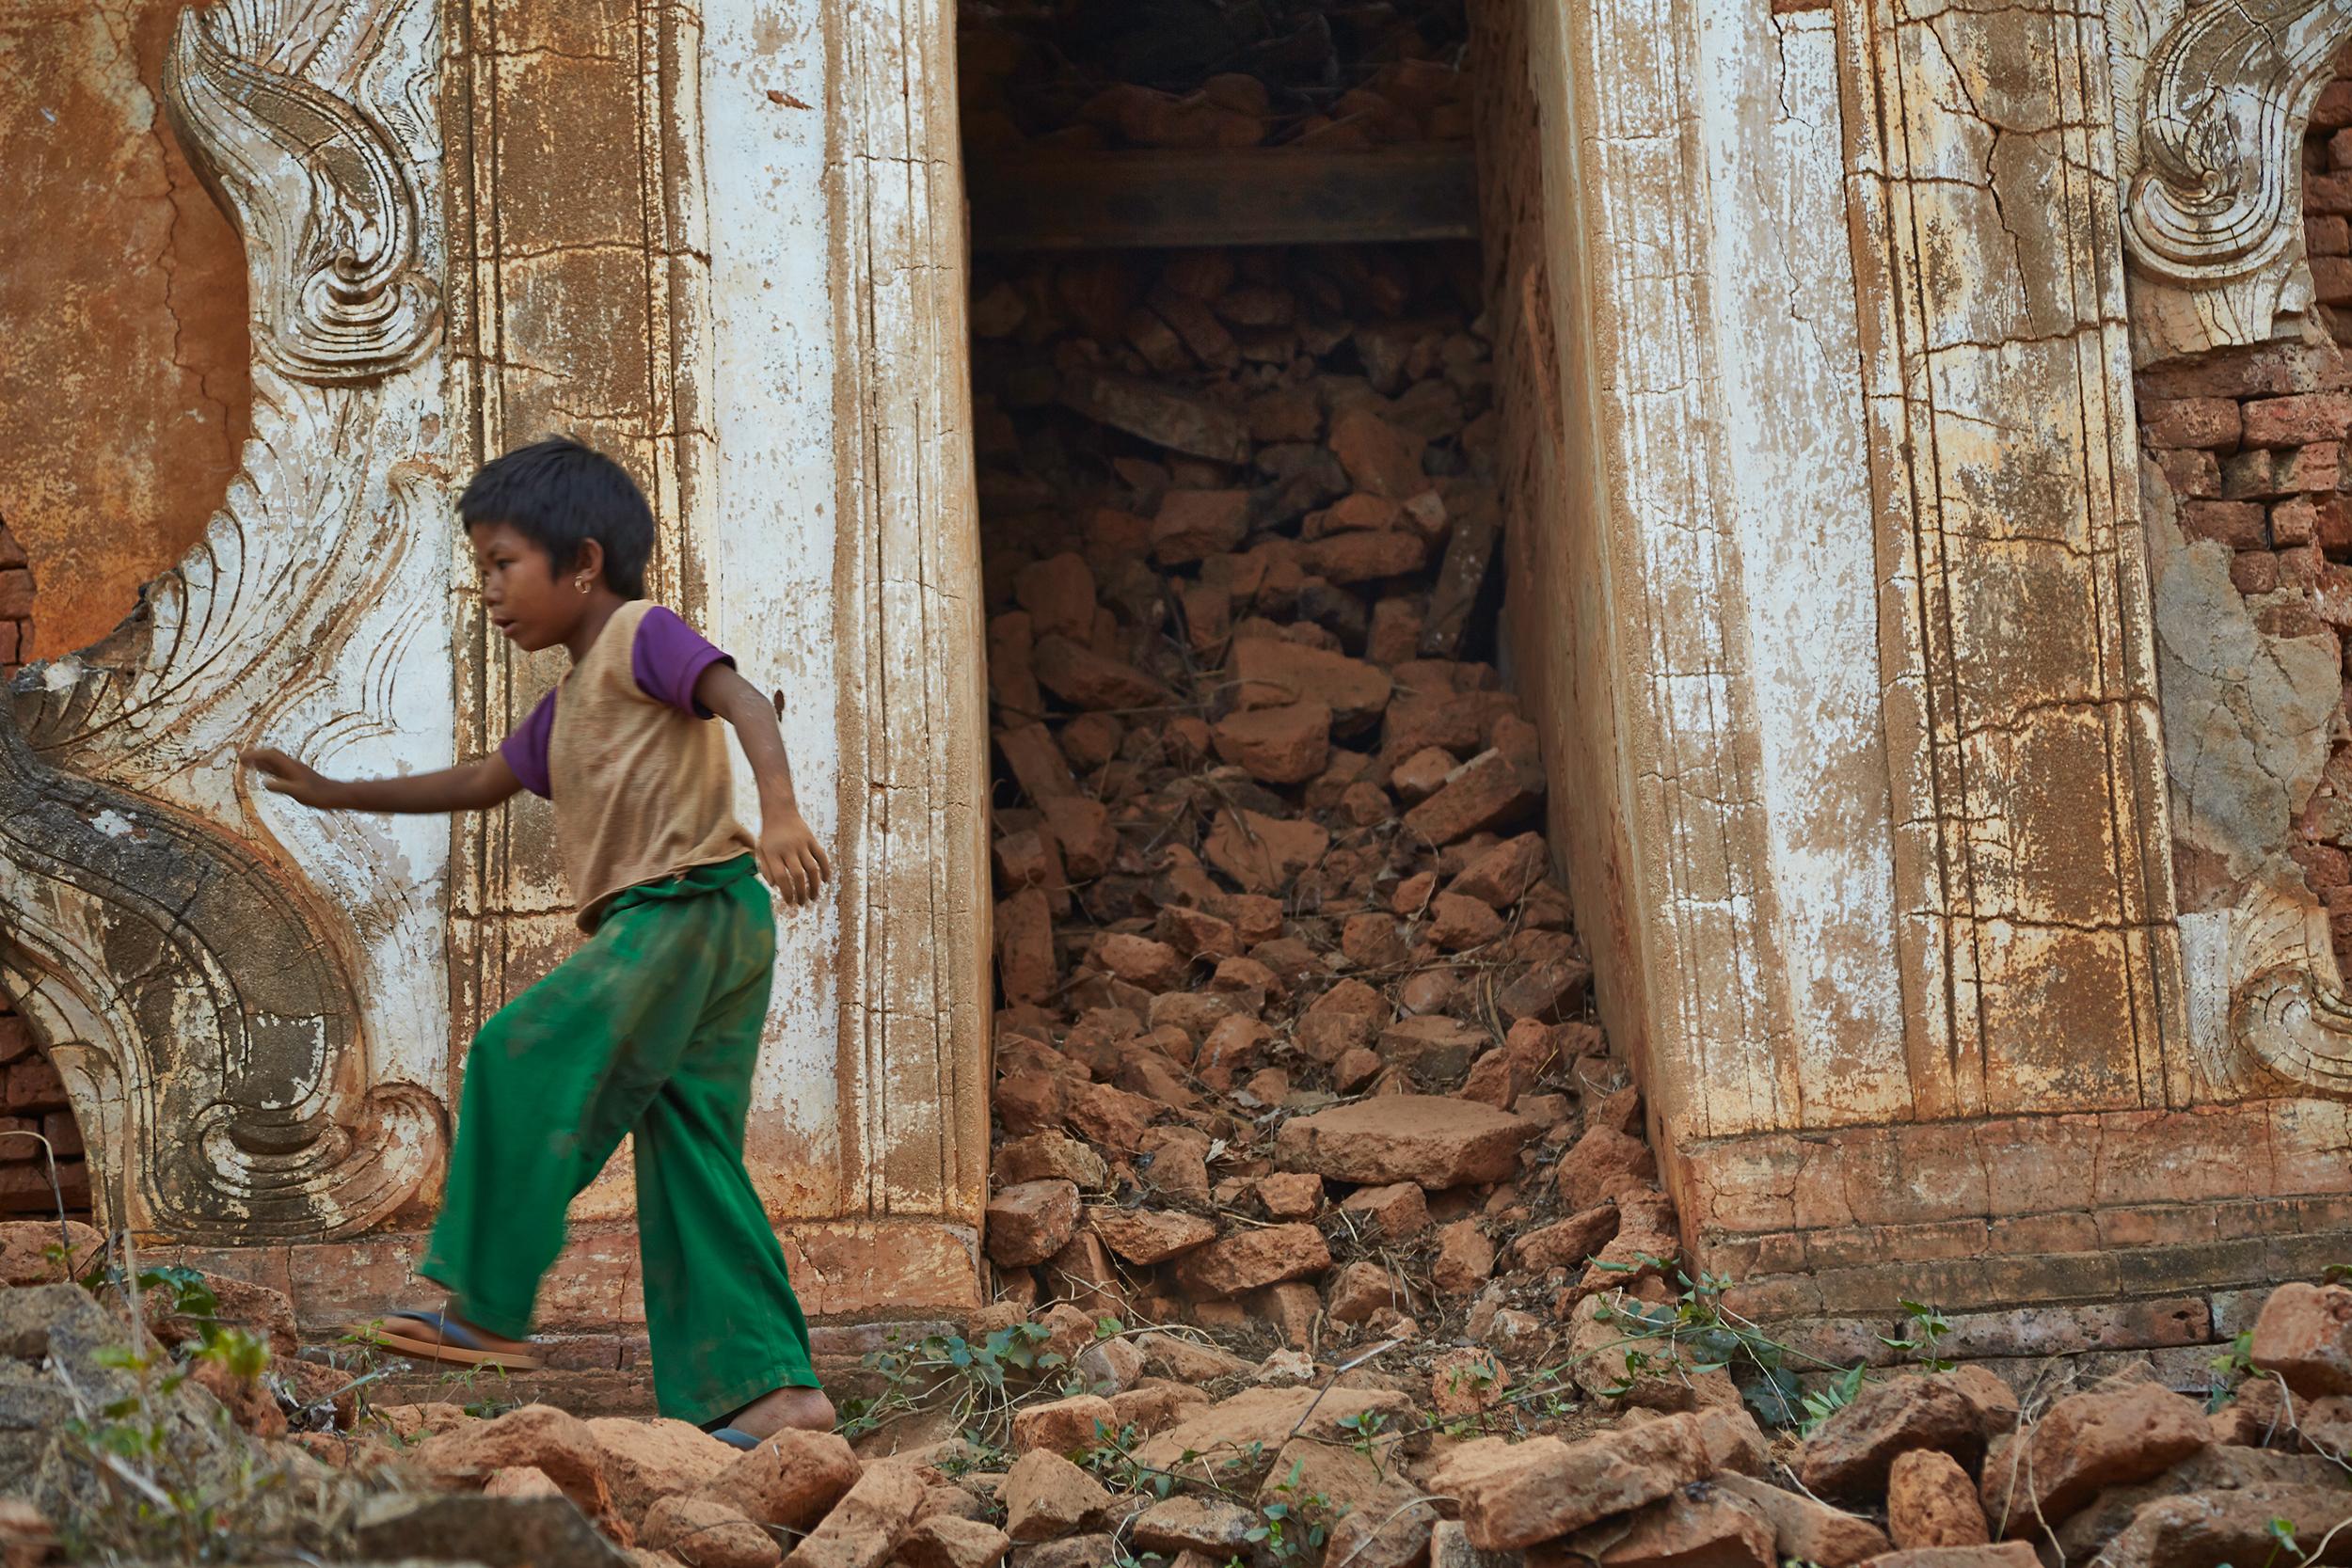 Kanjana-Chaiwatanachai-Image-Works_Mandalay-Riverside-2_2014.01.19_0092w.jpg